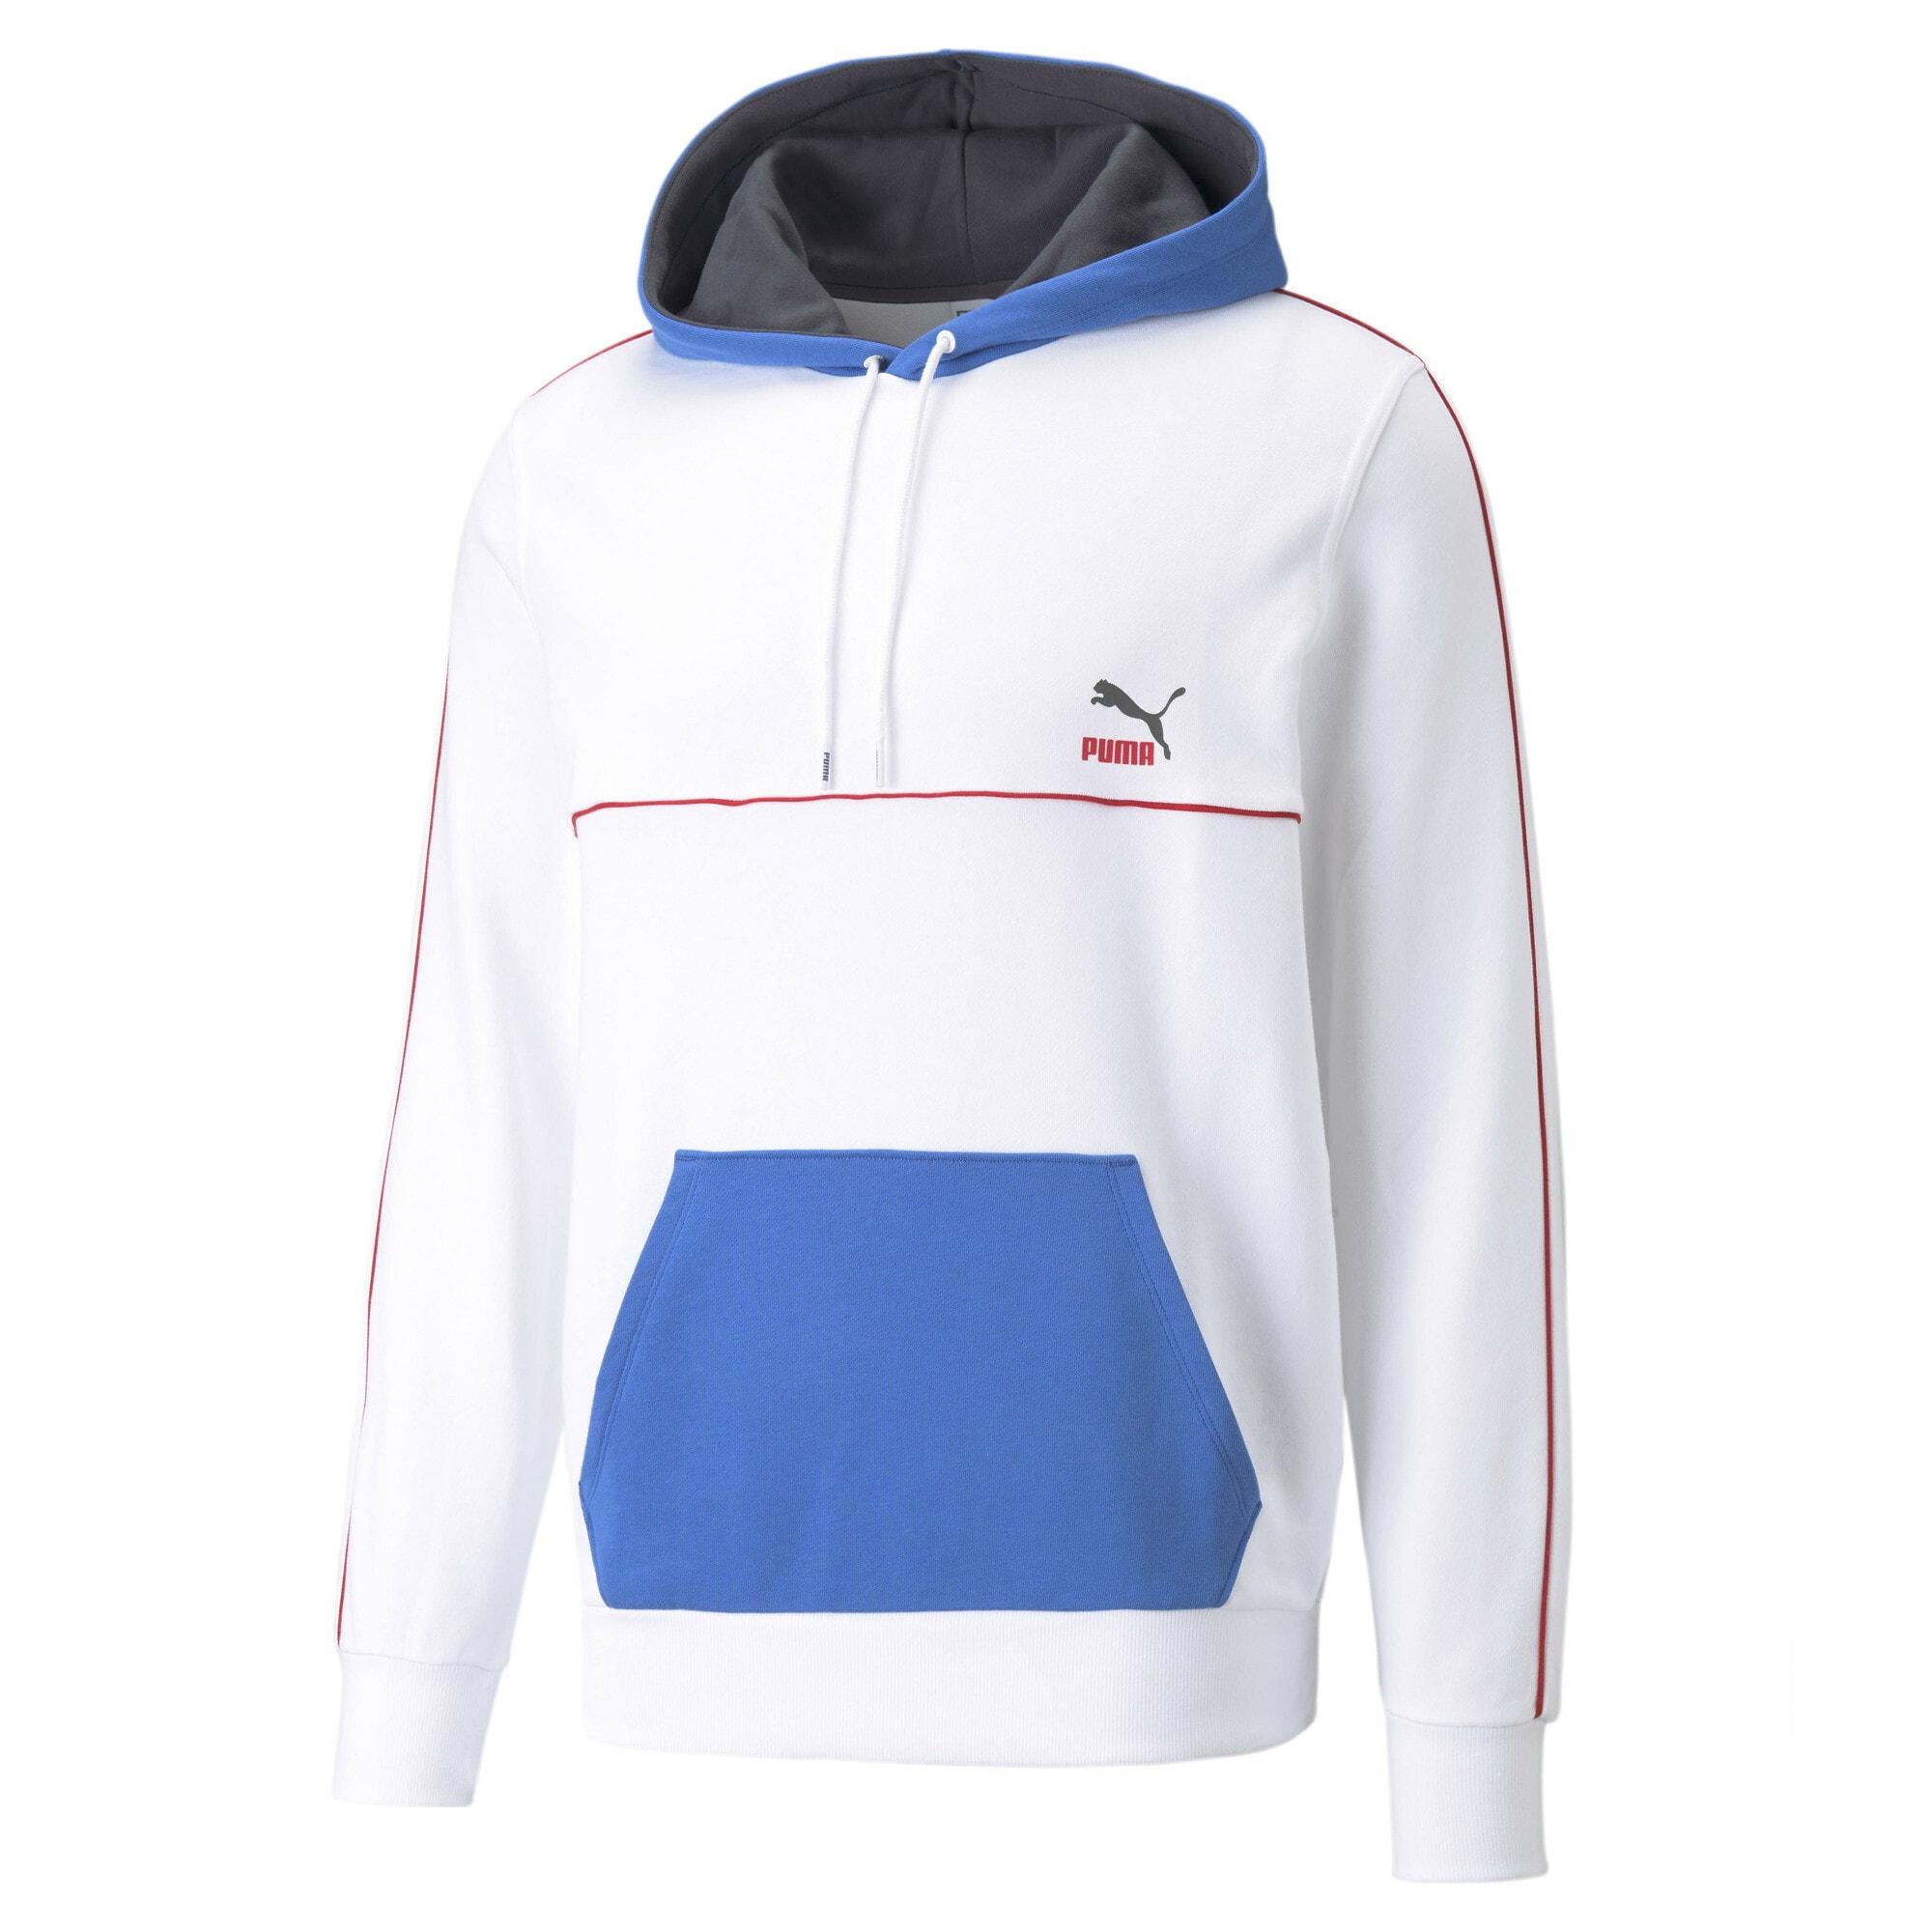 PUMA Felpa  bianco / blu cobalto / rosso male shop the look